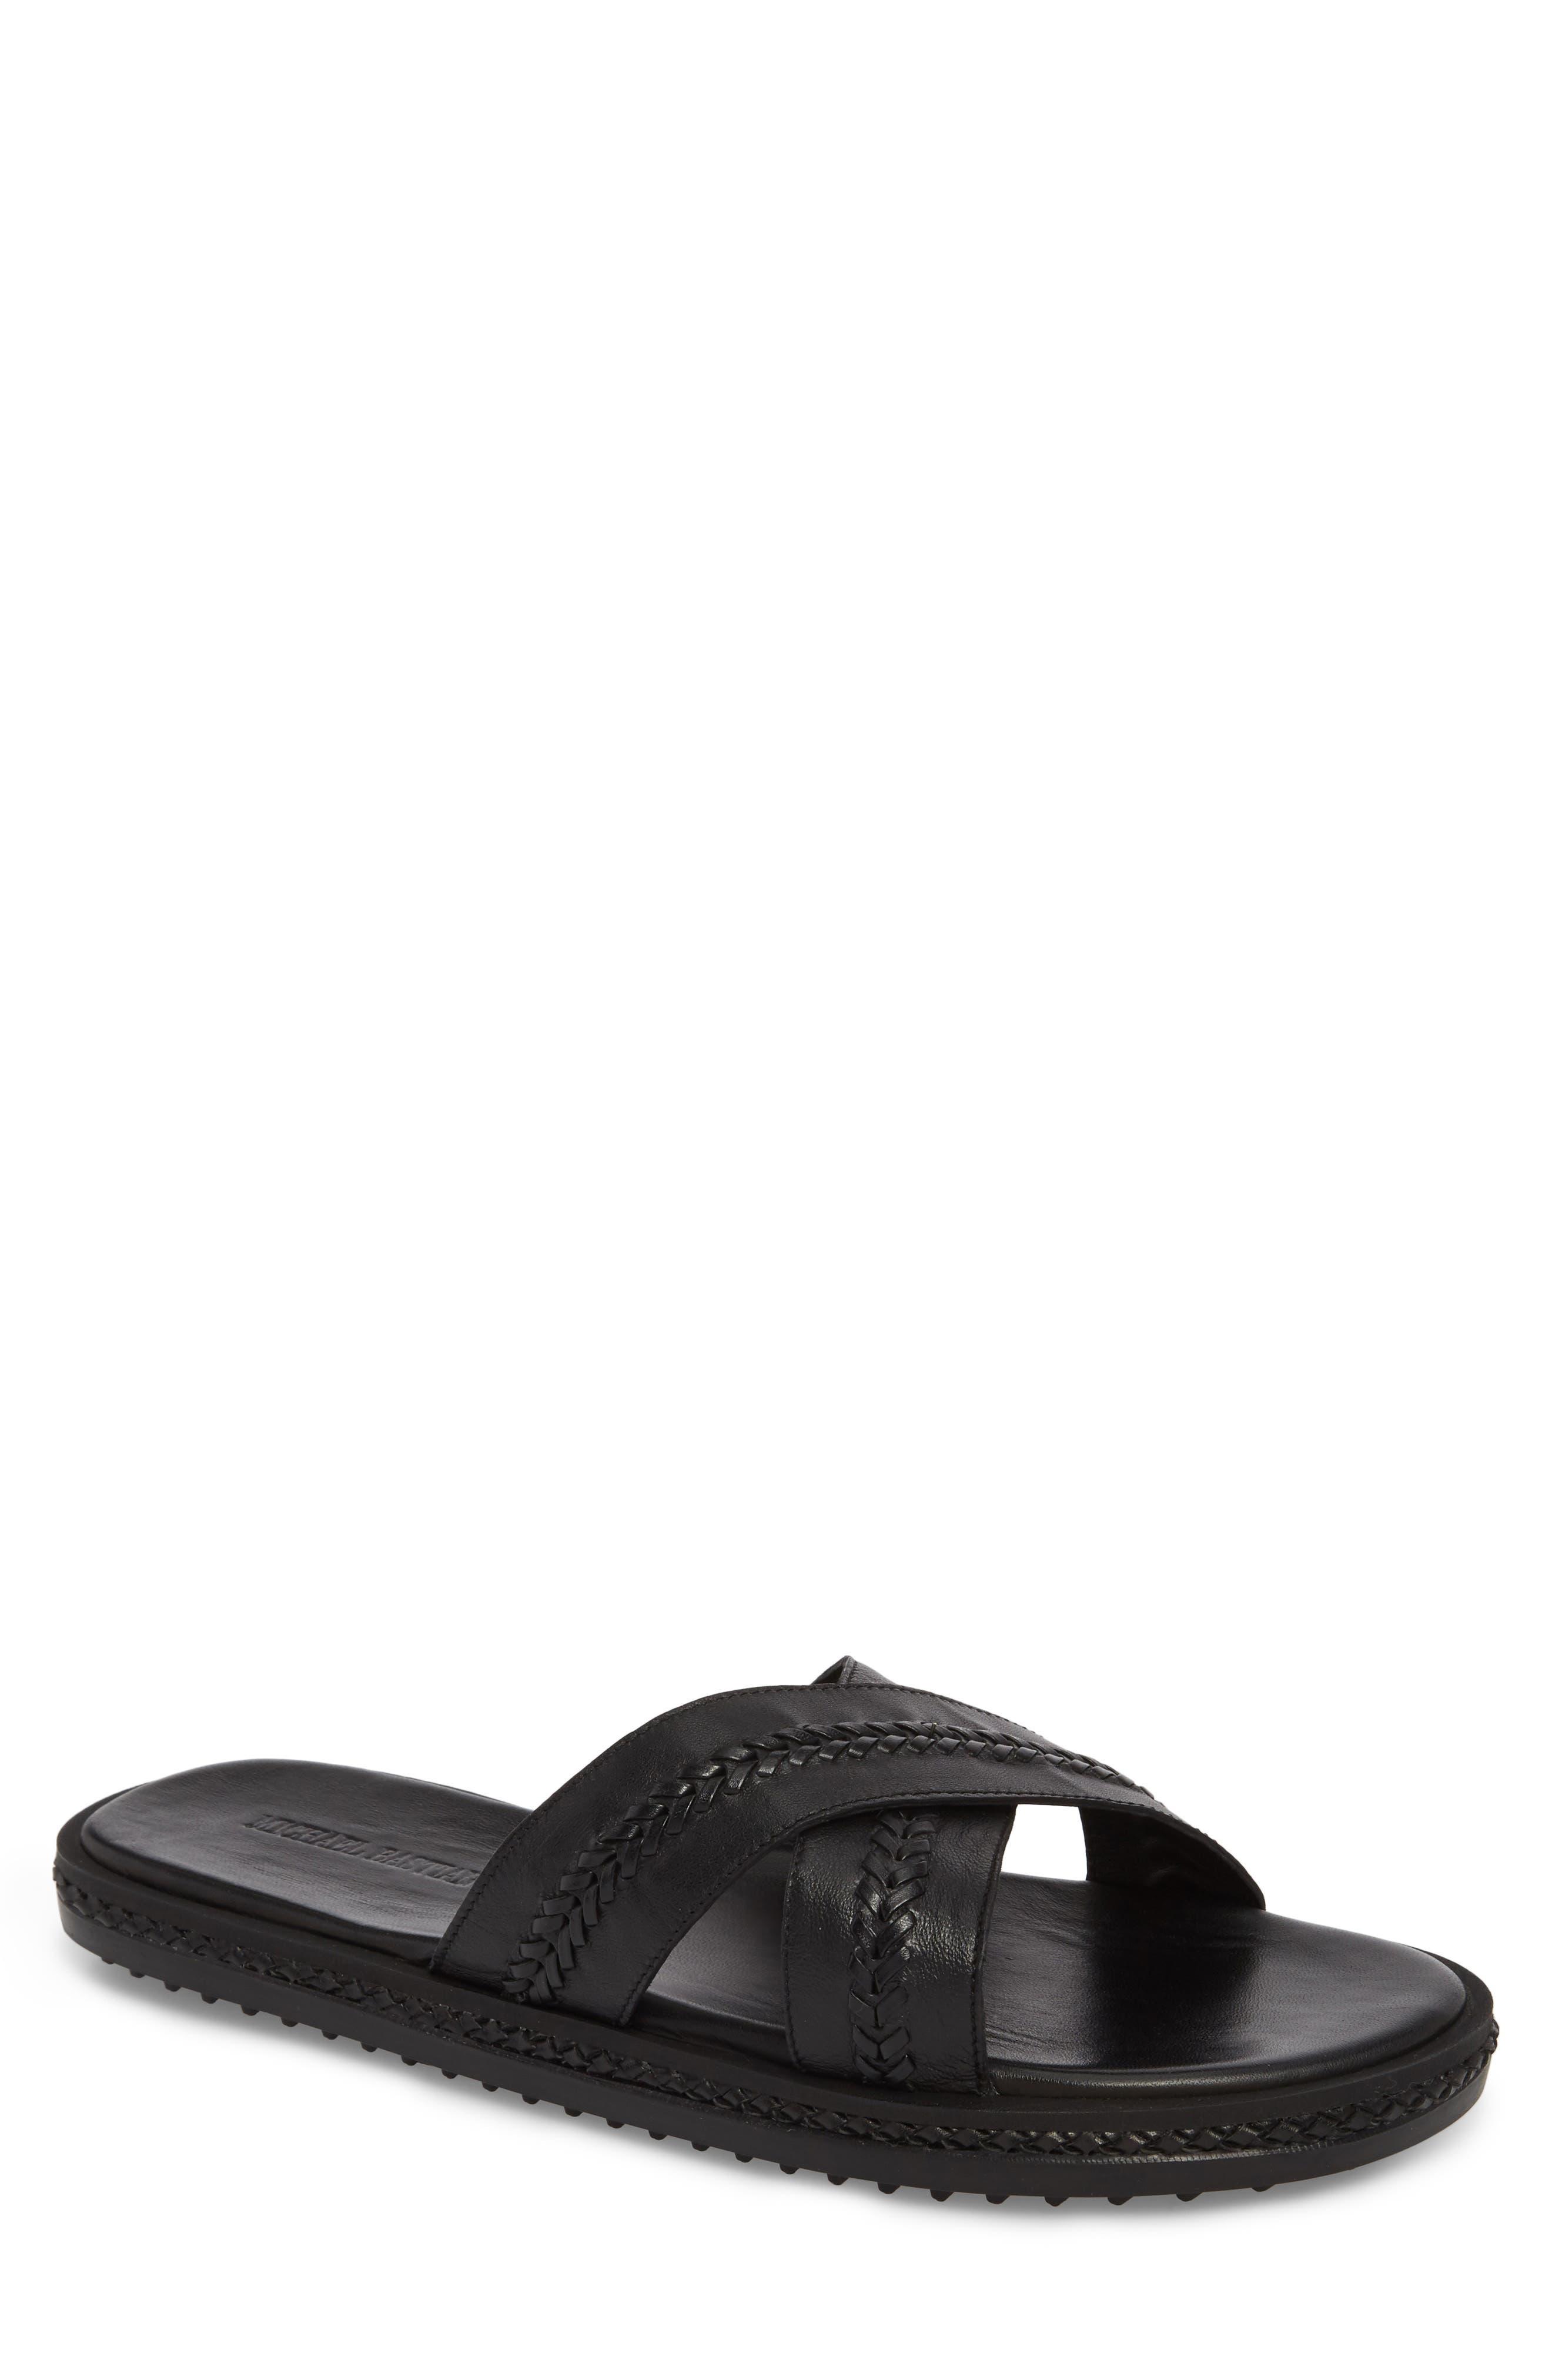 Woven Cross Strap Slide Sandal,                             Main thumbnail 1, color,                             Black Leather